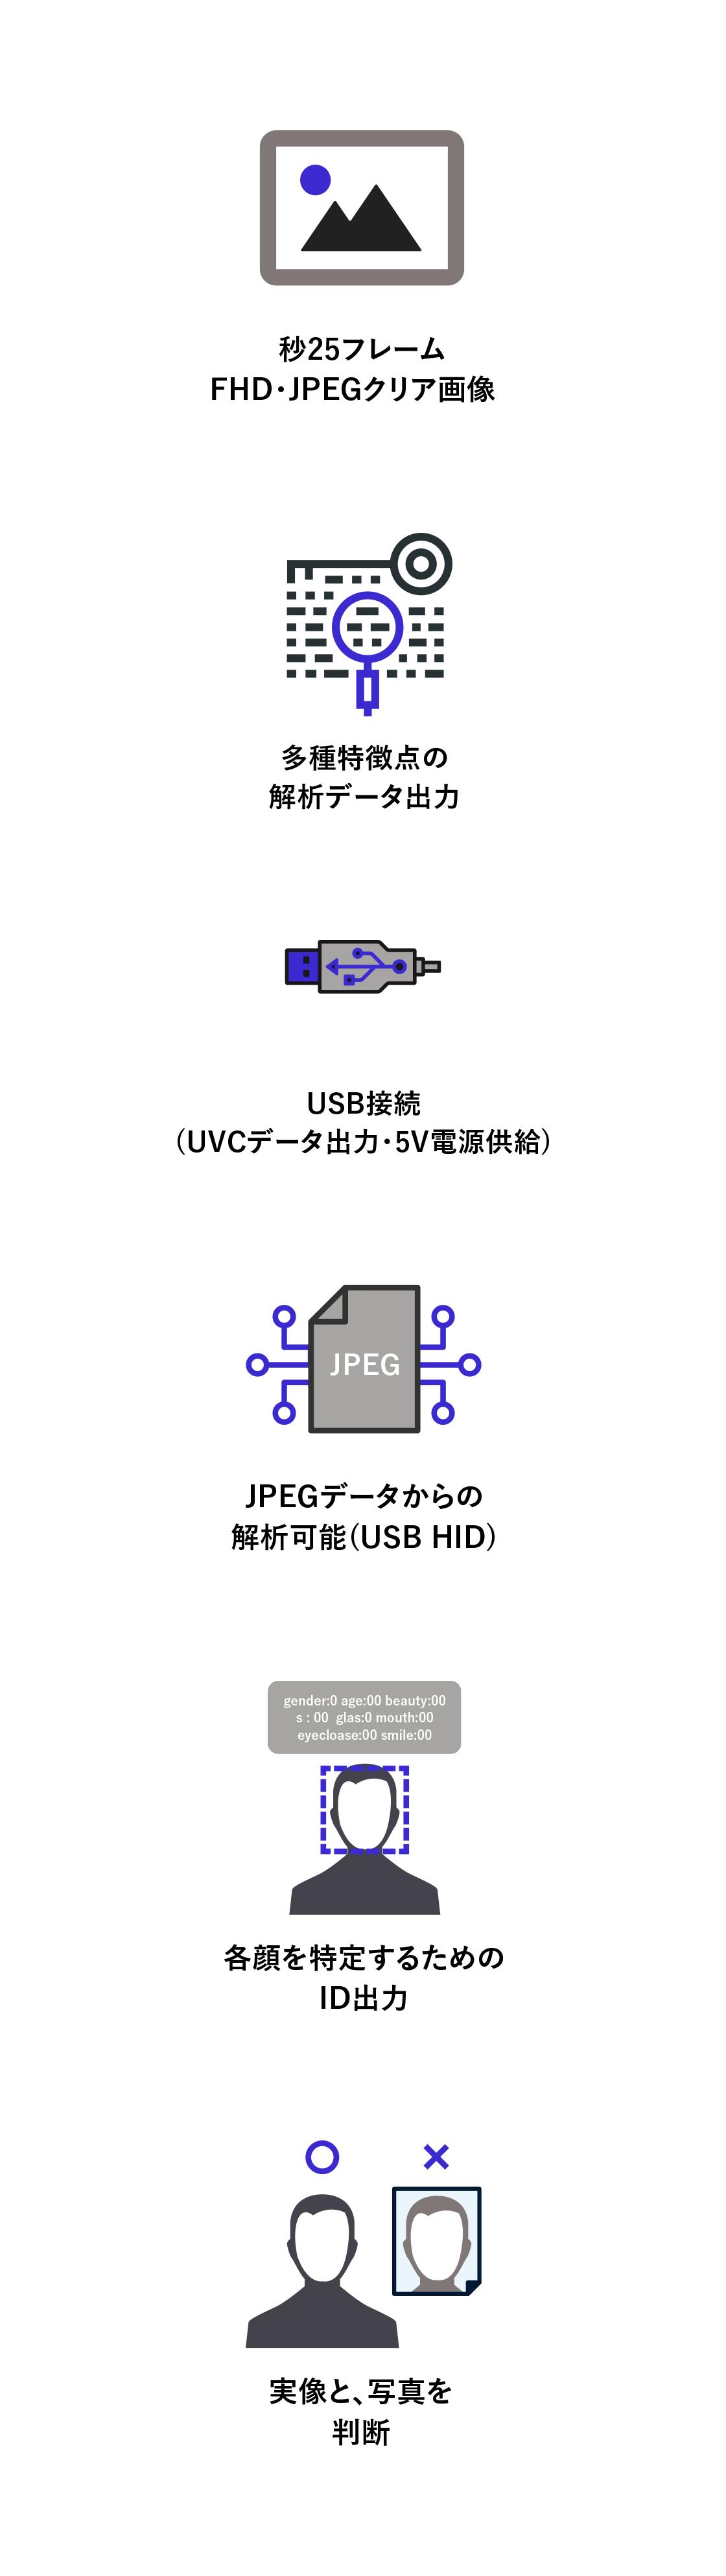 ①FHD・JPEGクリア映像 ②多種特徴解析データ出力③USBインタフェース④写真と実像の区別⑤JPEG画像からの特徴点抽出も可能